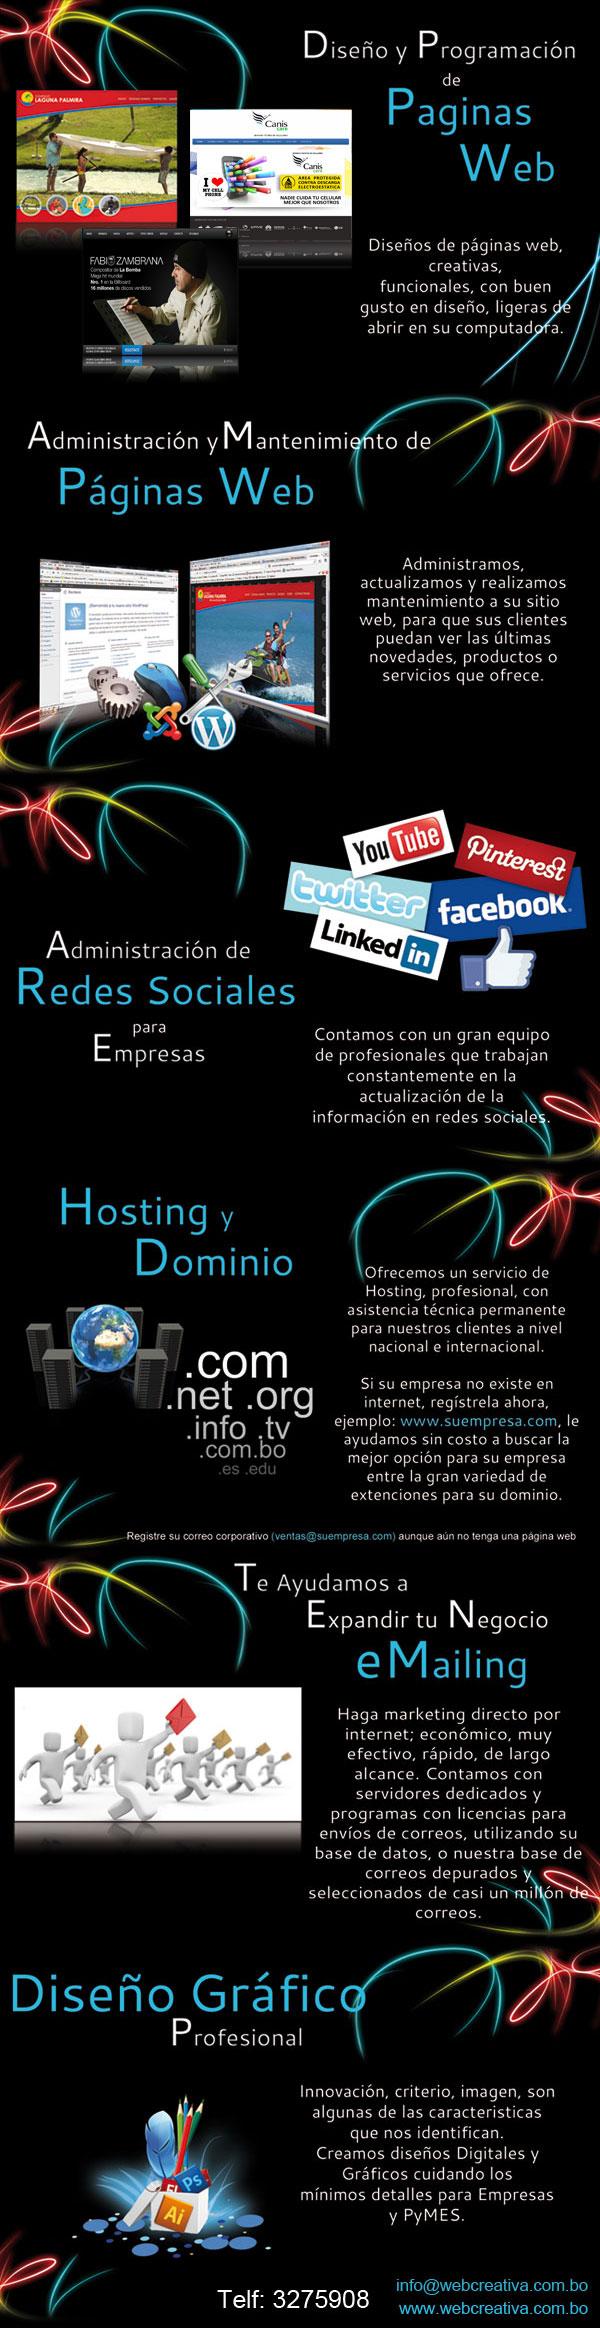 webcreativa